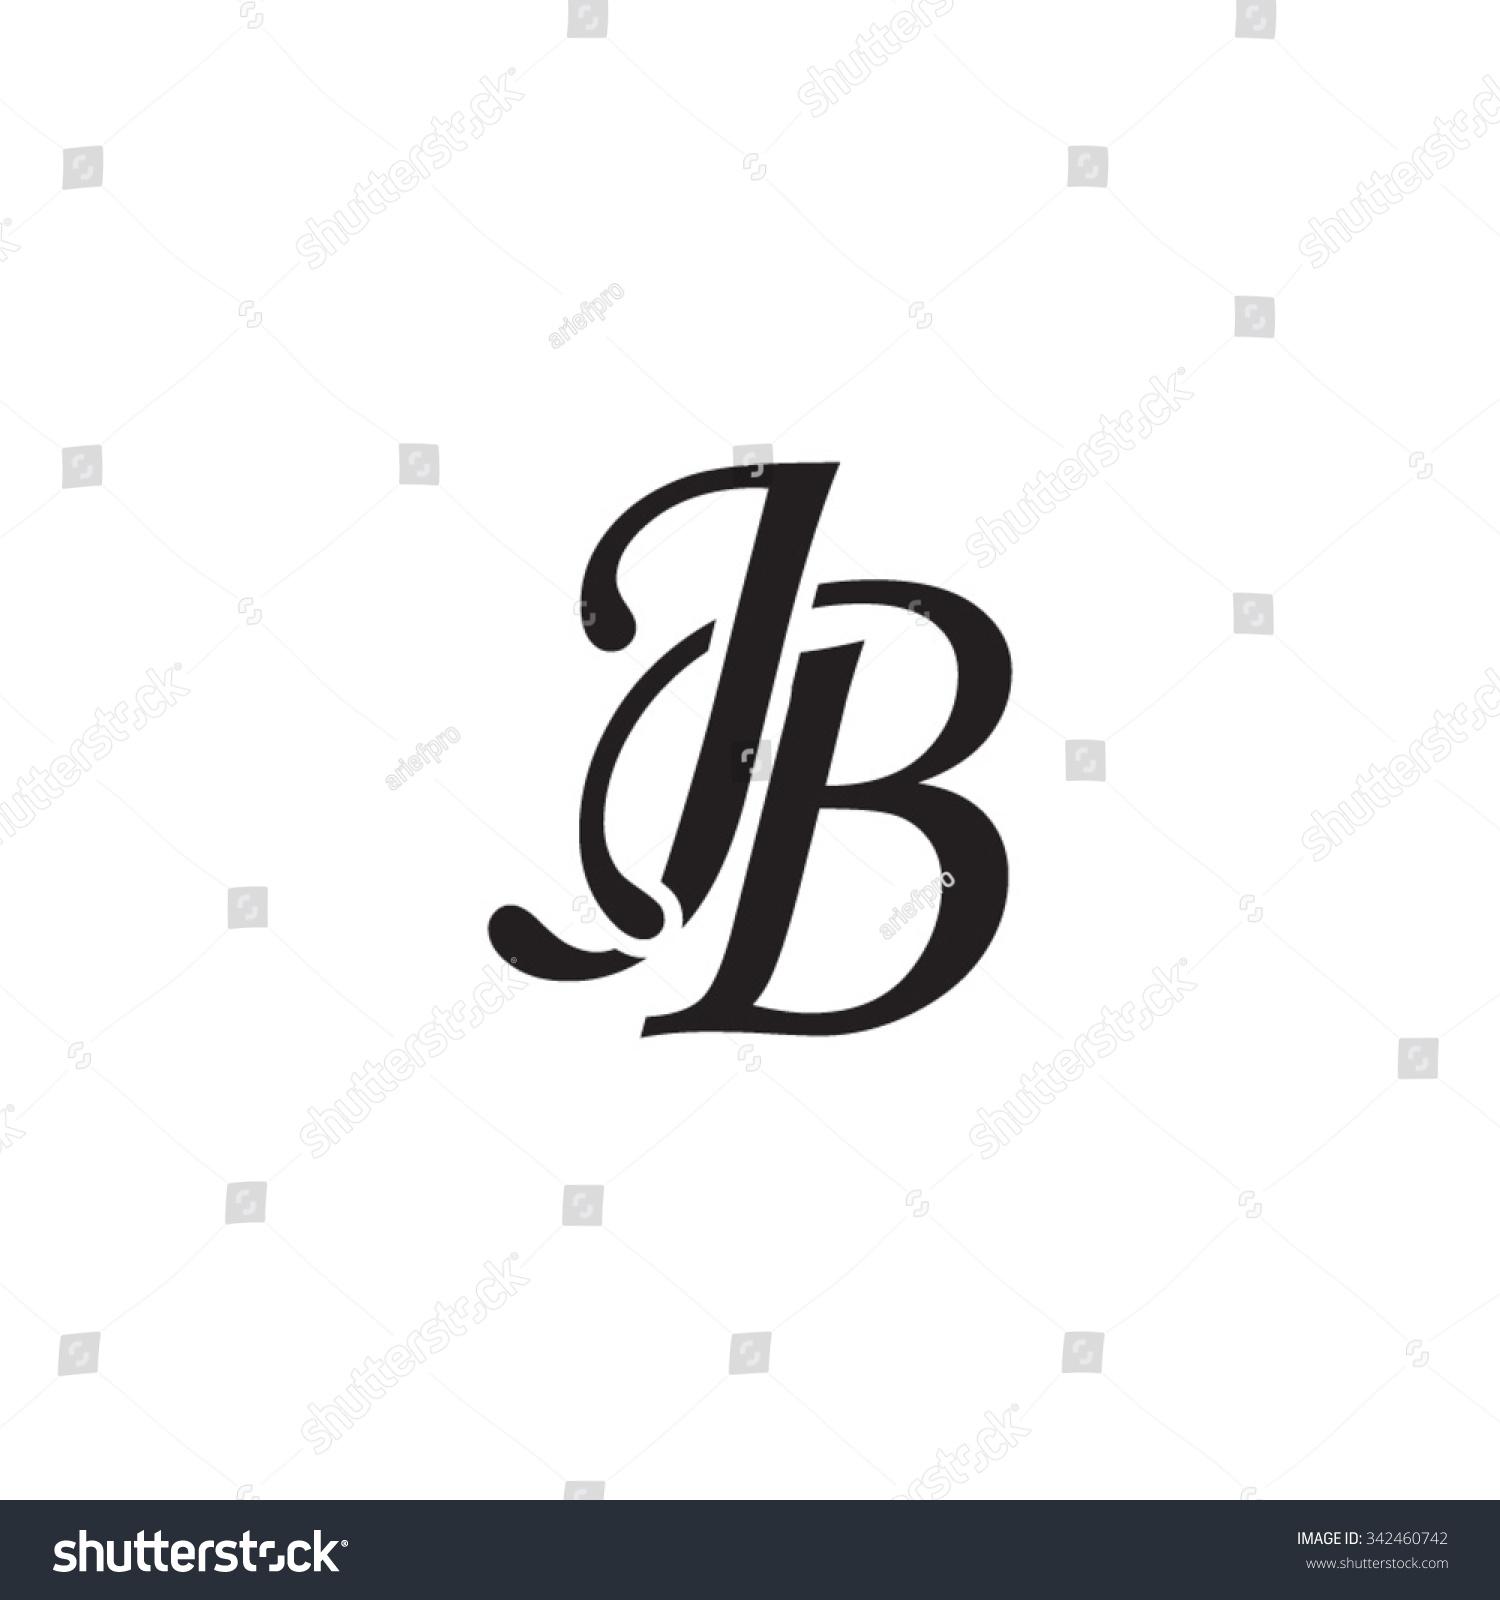 stock-vector-jb-initial-monogram-logo-342460742 Antique Monogram Letter C Template on